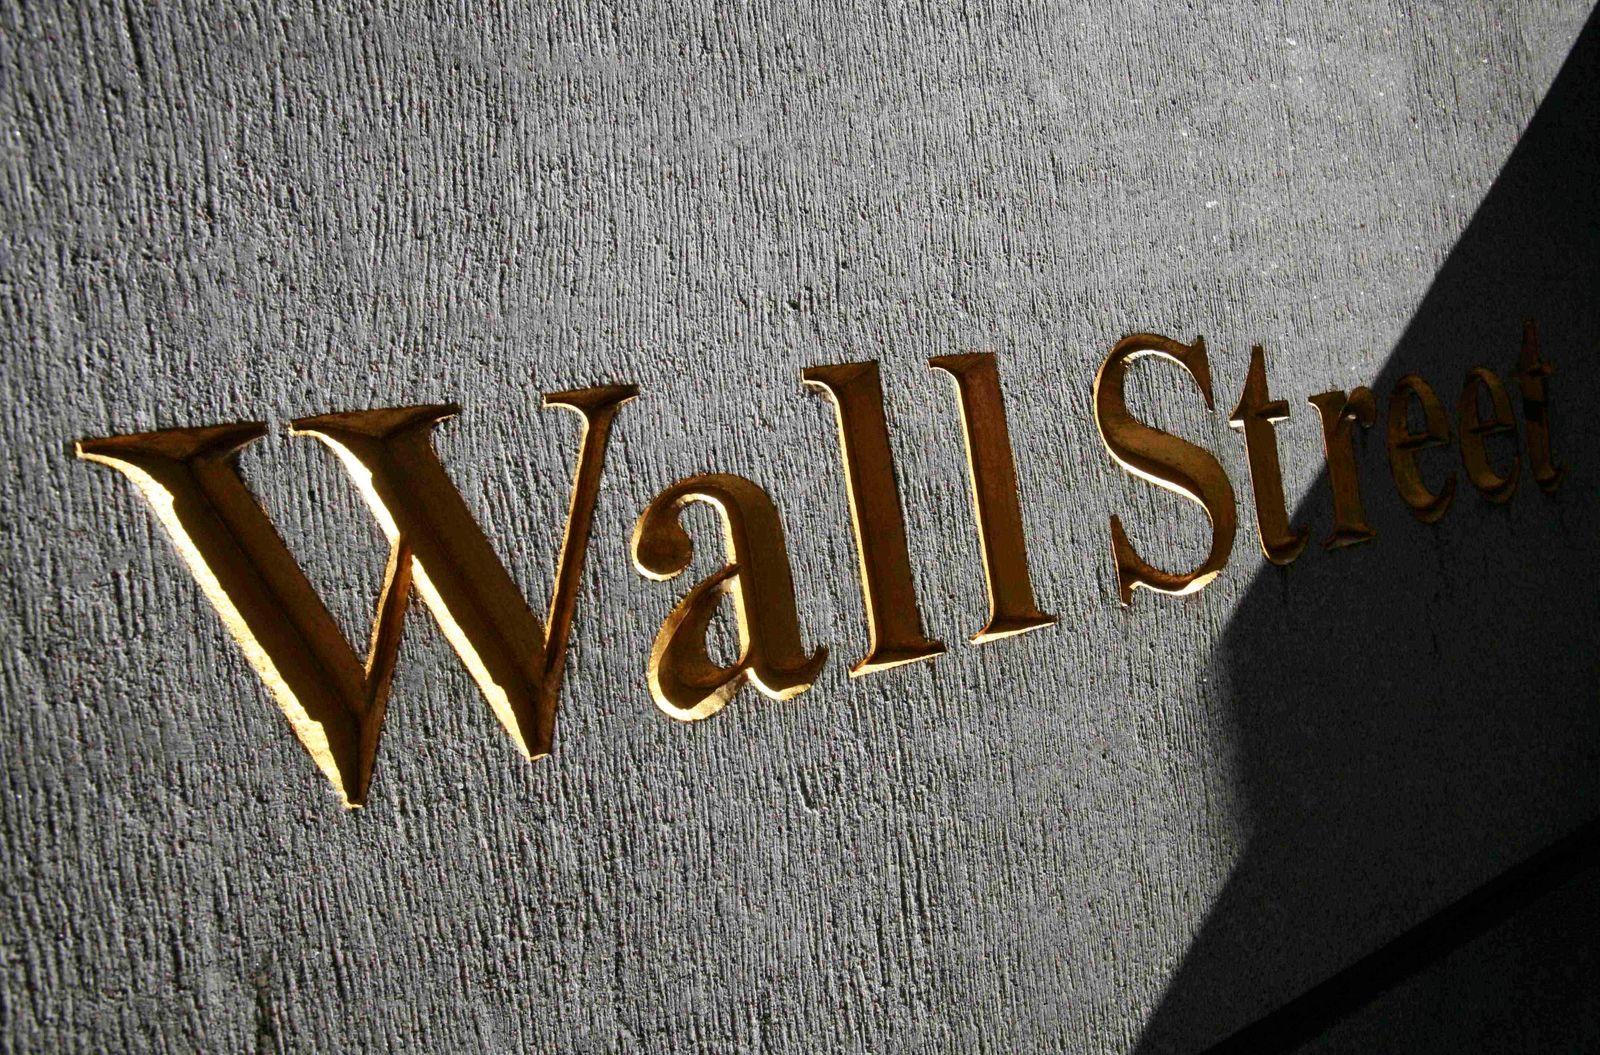 Weltwirtschaft/ Börsenbeben/ Wall Street